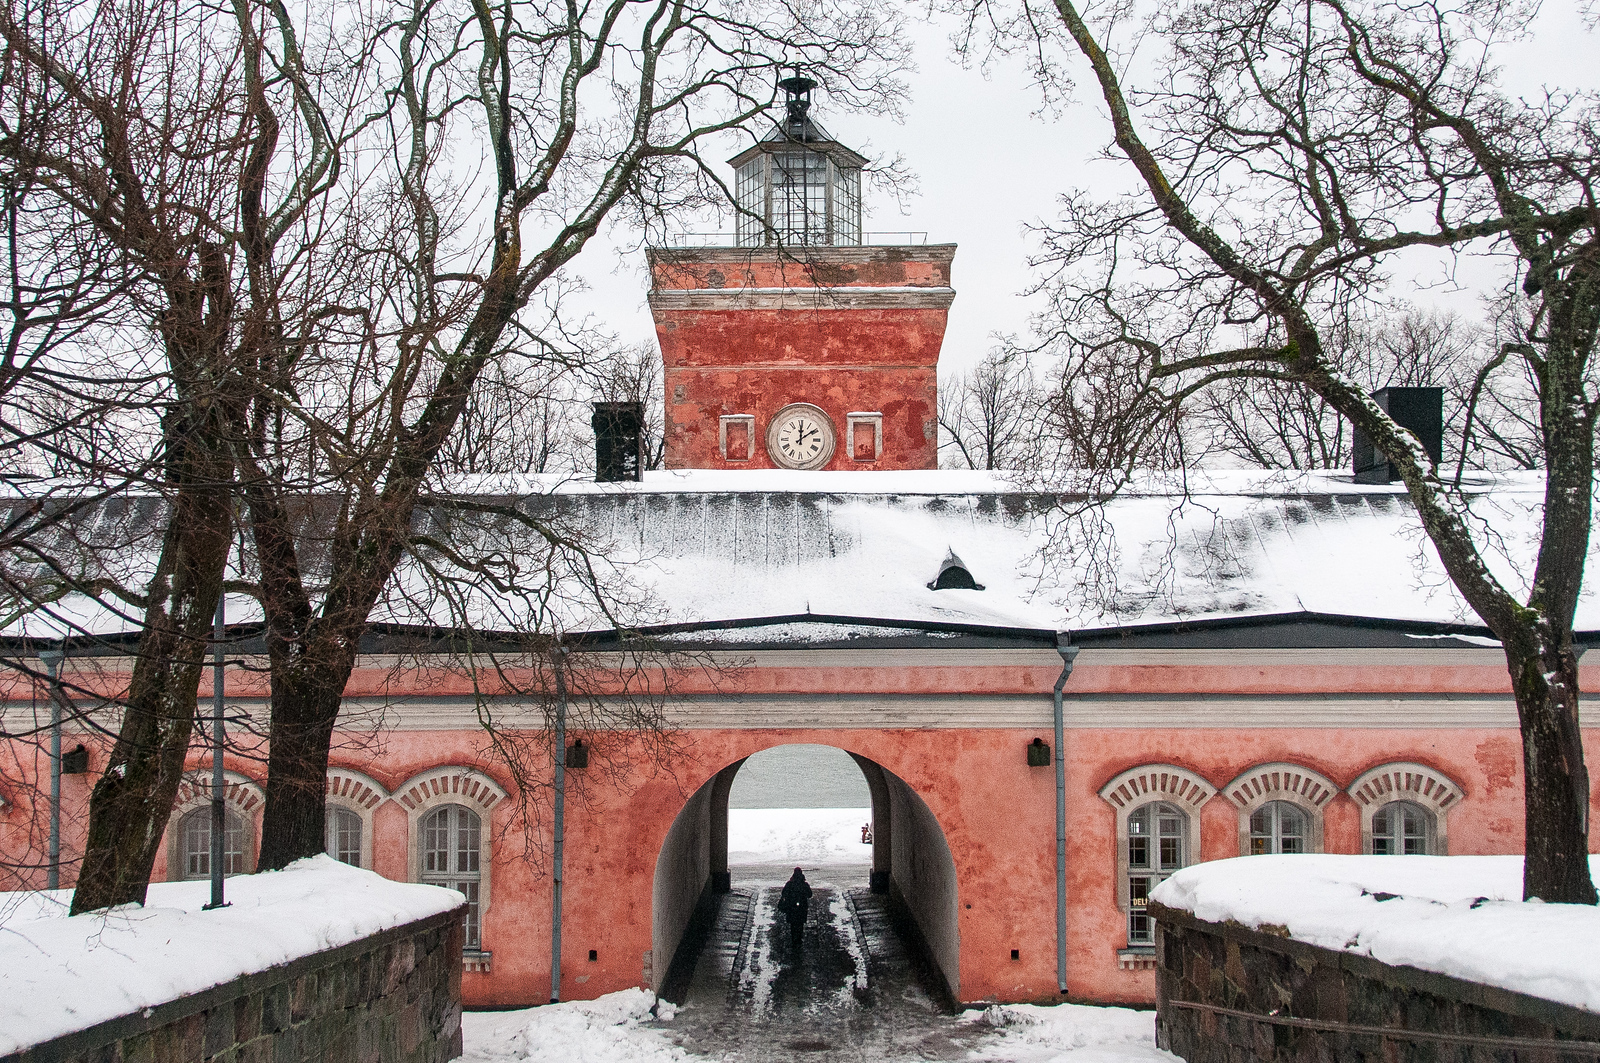 Fortress of Suomenlinna UNESCO World Heritage Site, Finland